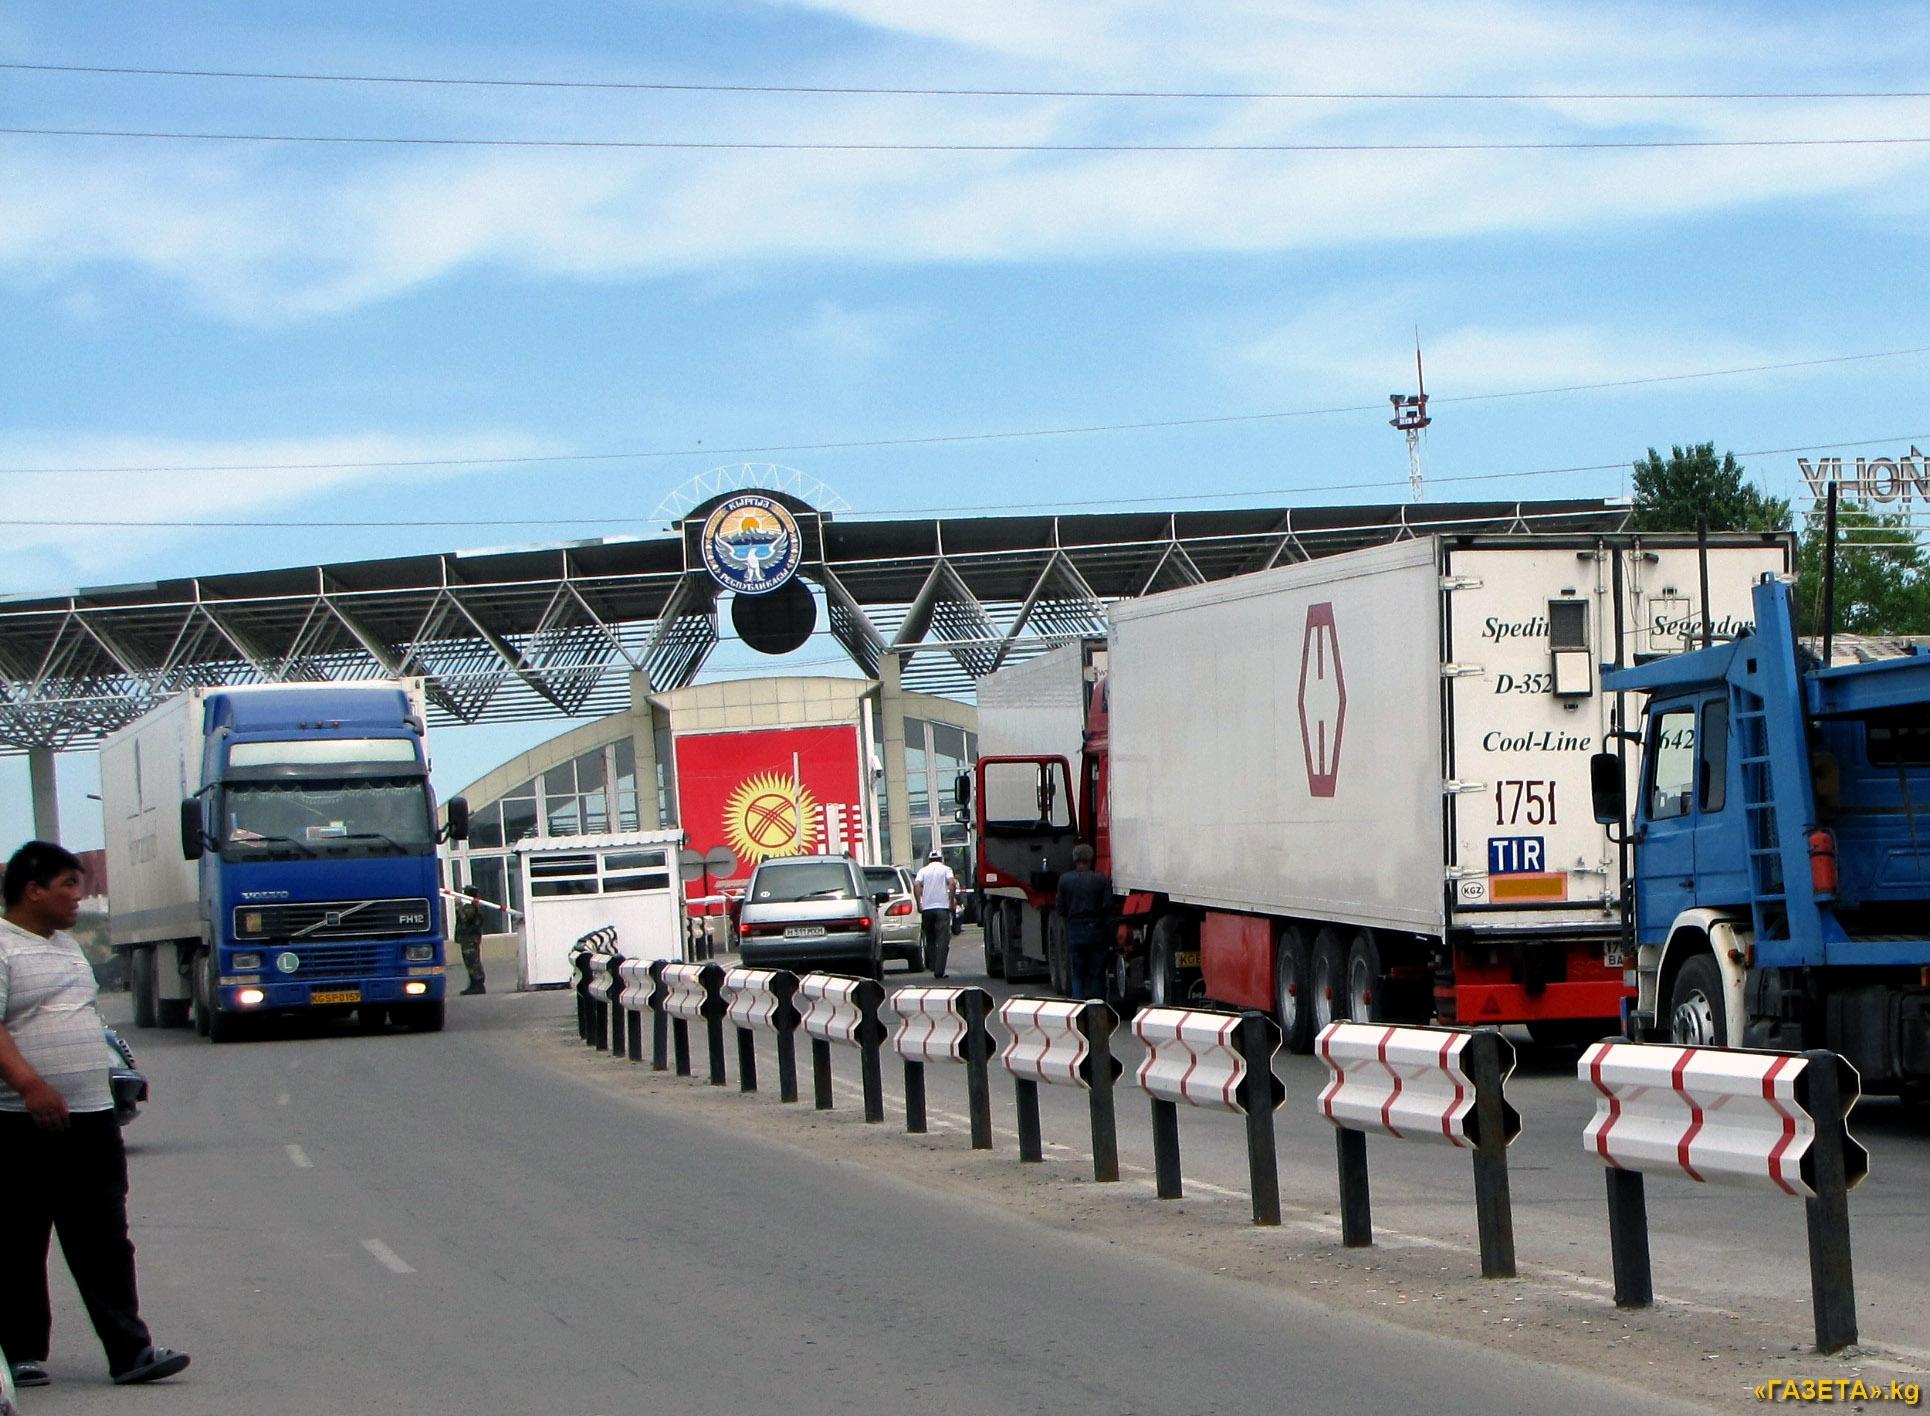 Пункт пропуска на кыргызско-казахской границе. Фото: Gazeta.kg.